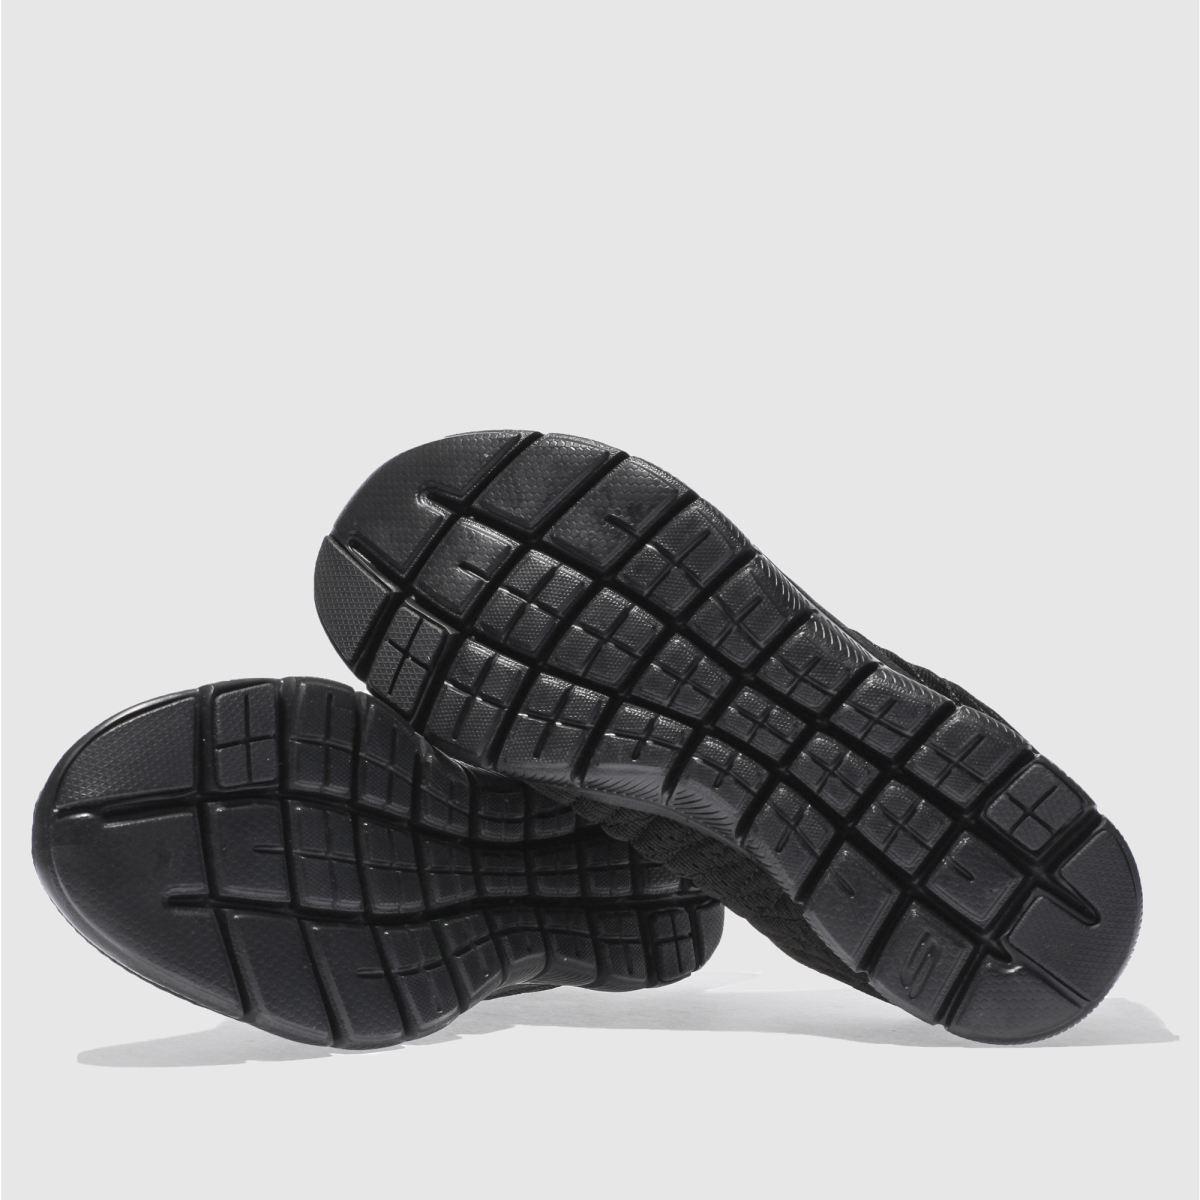 Damen 2.0 Schwarz skechers Flex Appeal 2.0 Damen Break Free Sneaker | schuh Gute Qualität beliebte Schuhe 2264e6